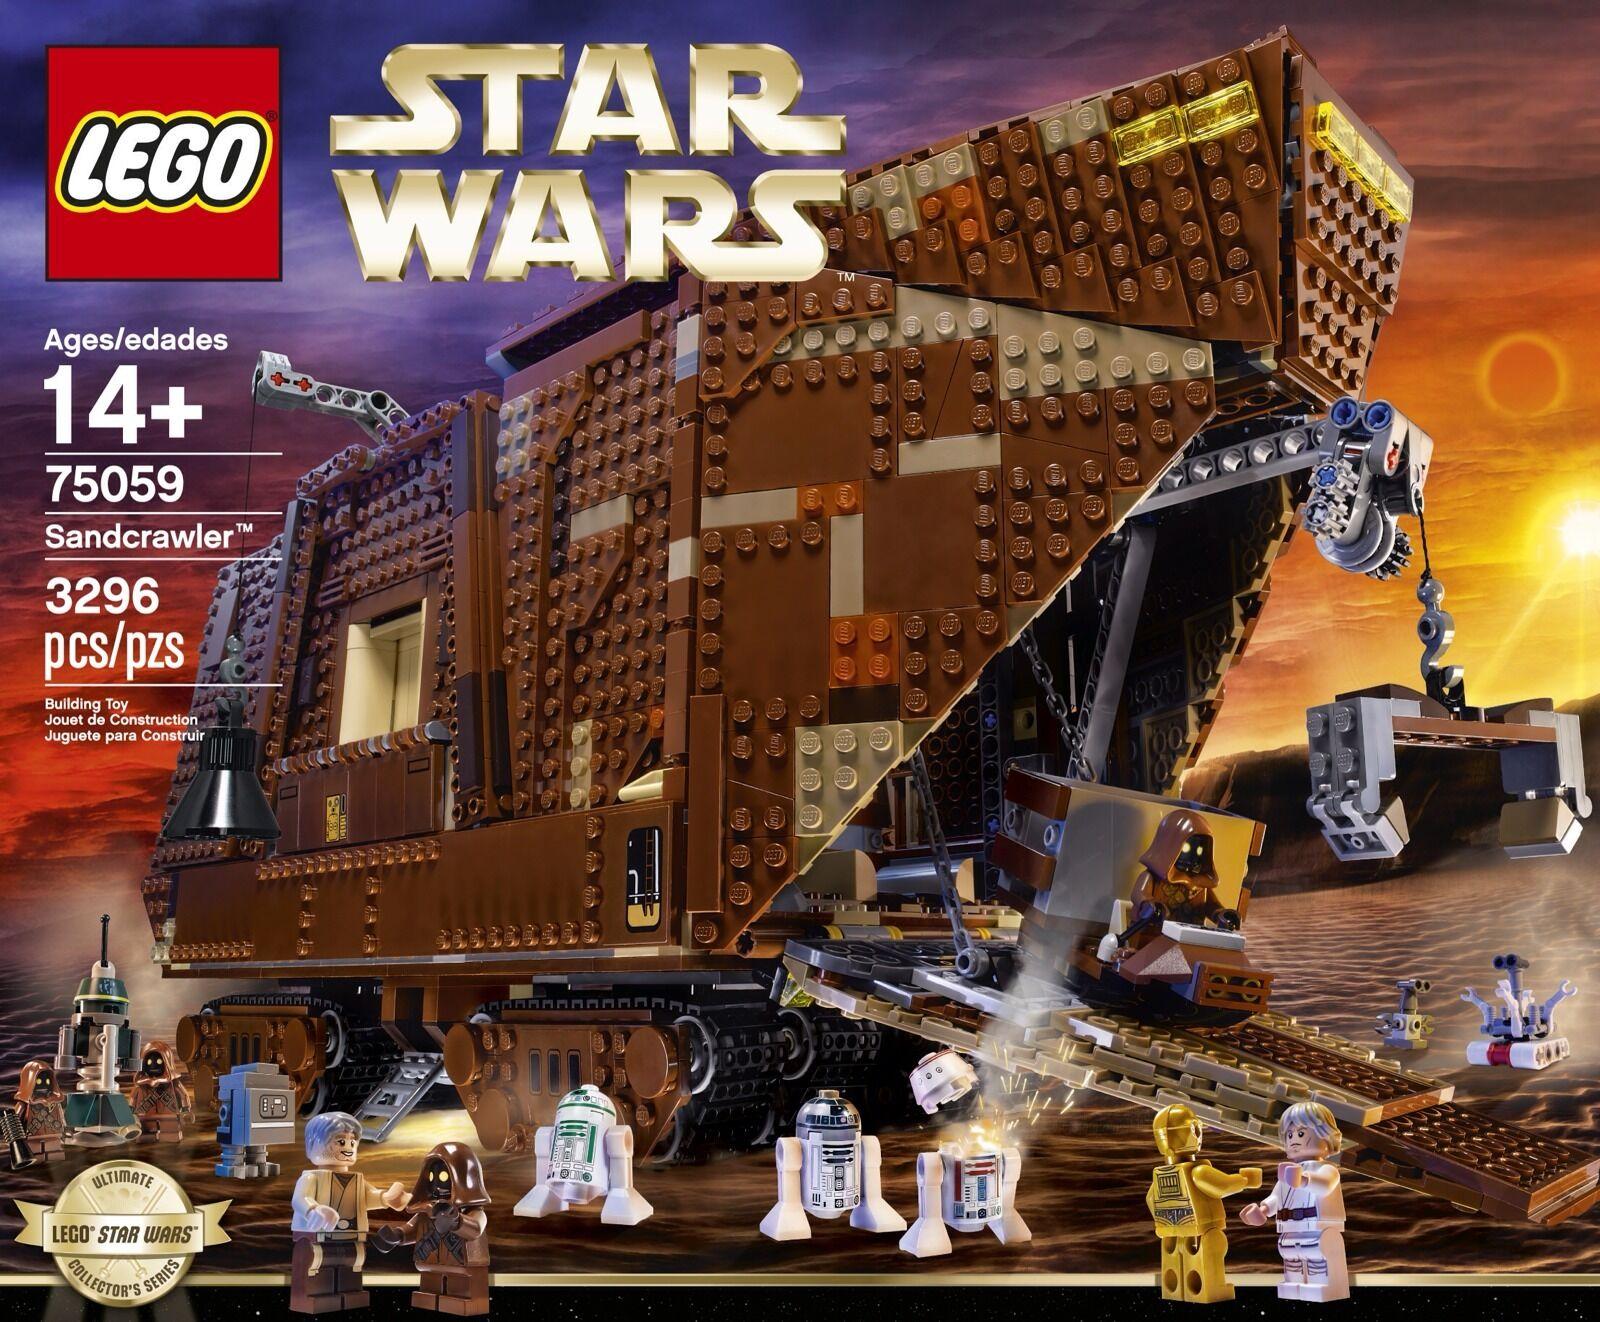 Lego Star Wars Sandcrawler 75059 New sealed A New Hope Mini Figures R2-D2